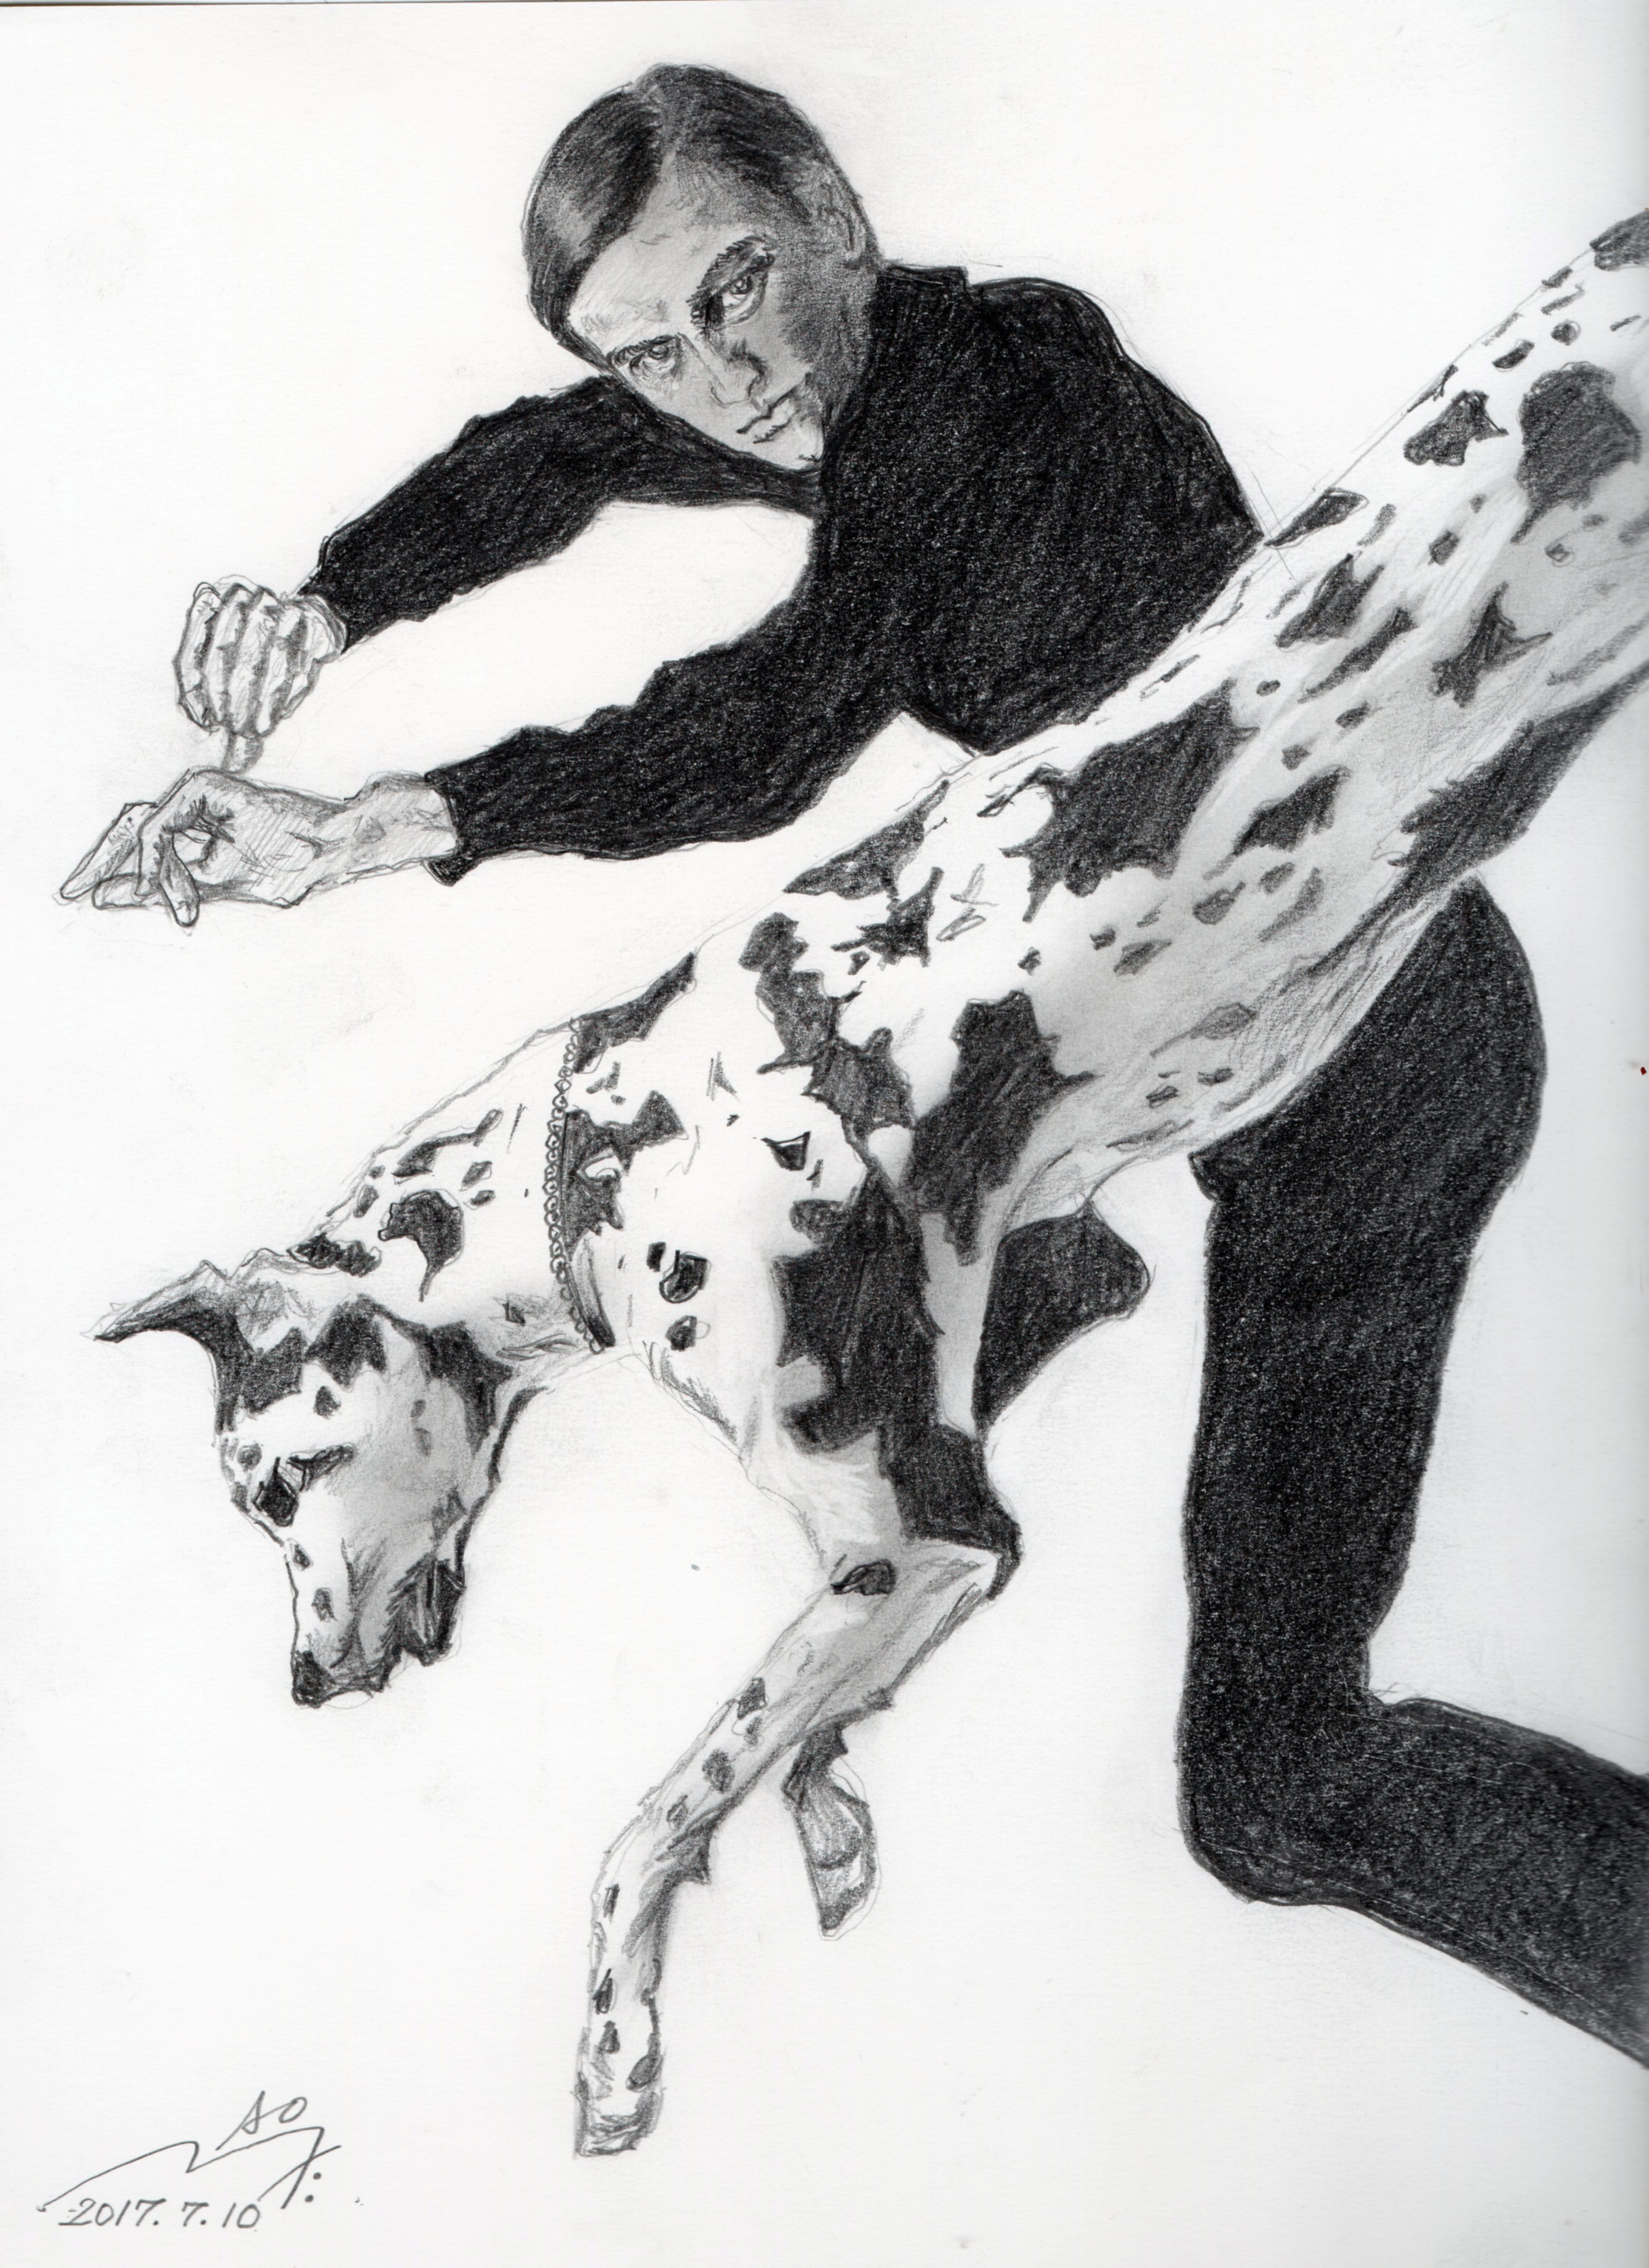 MG5団時朗の鉛筆画似顔絵